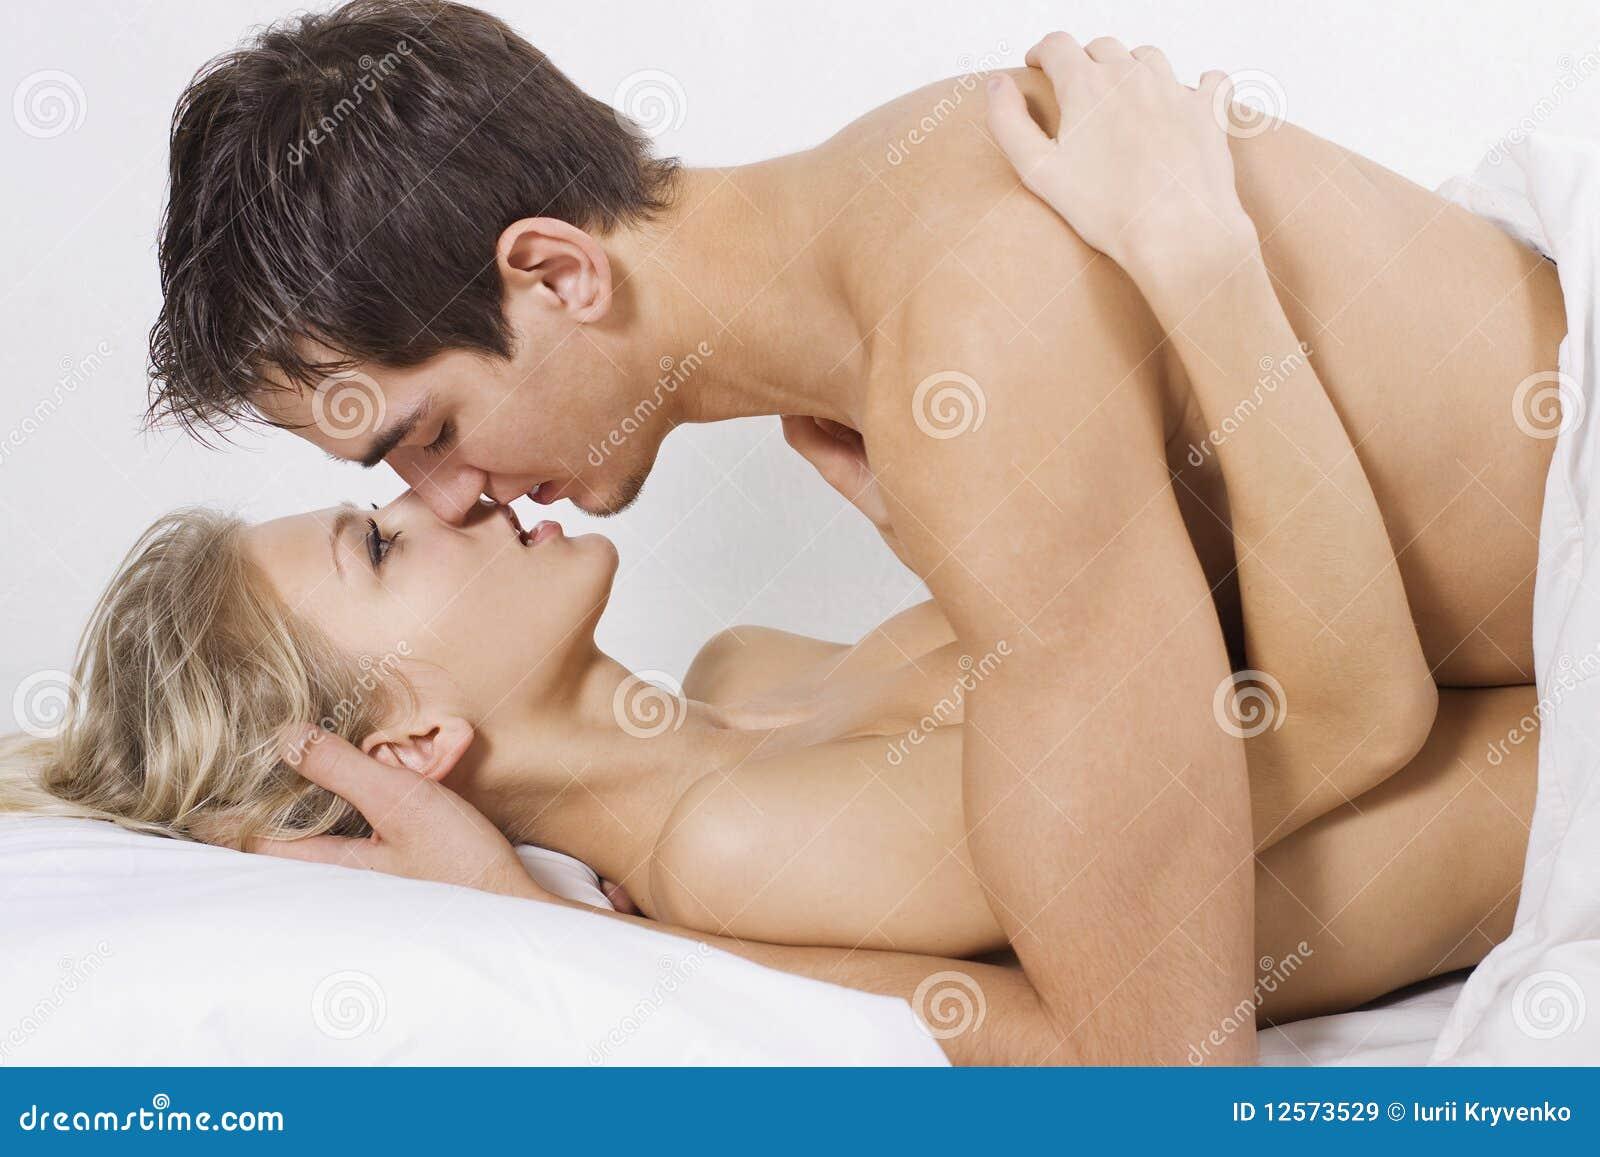 Cinte nude donne in